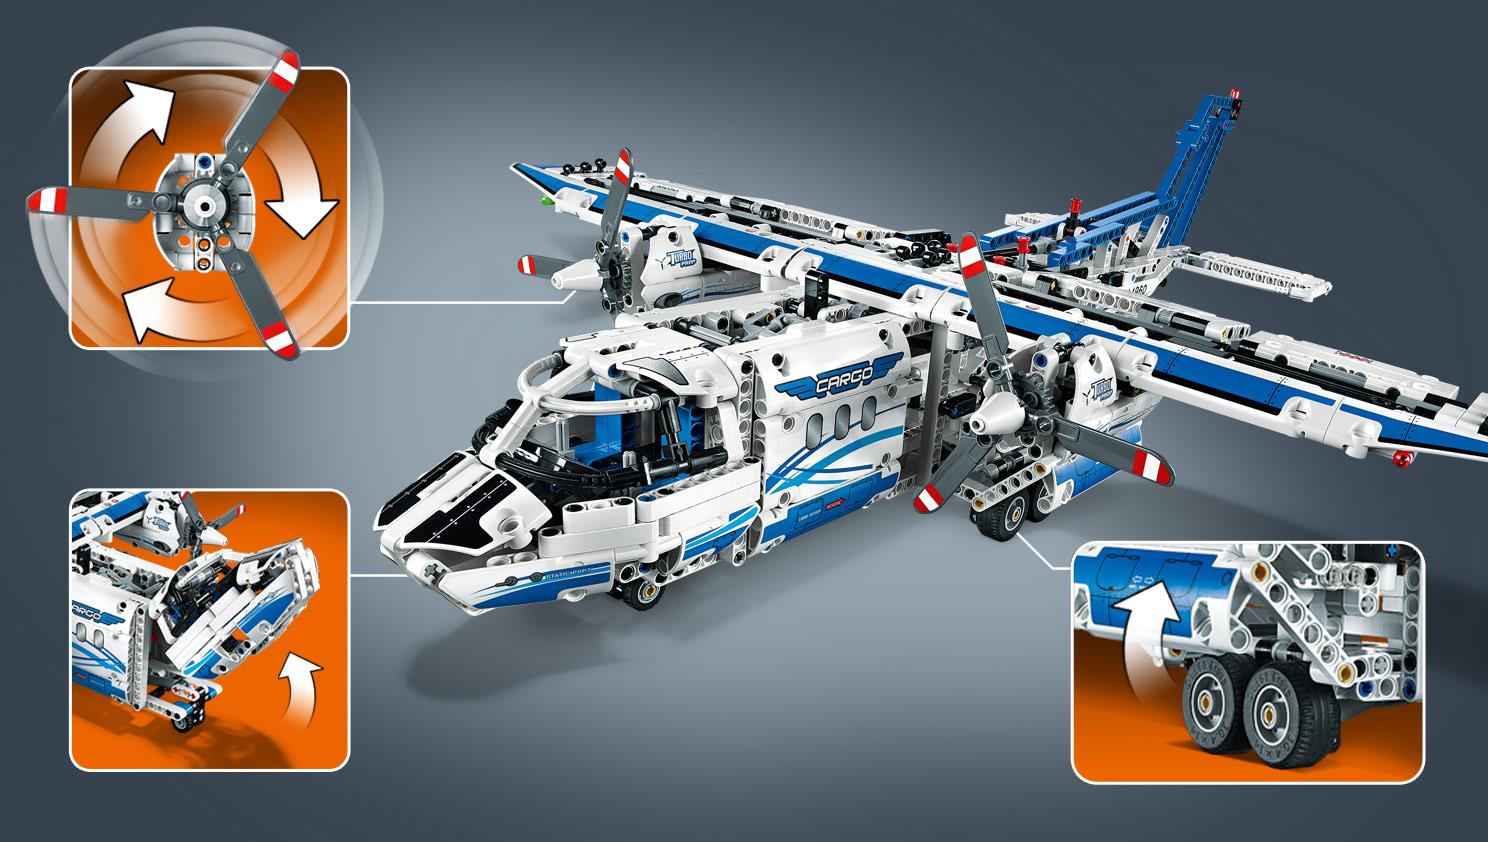 Lego Technic 42025 : l'avion cargo 42025_Additional-Image_03